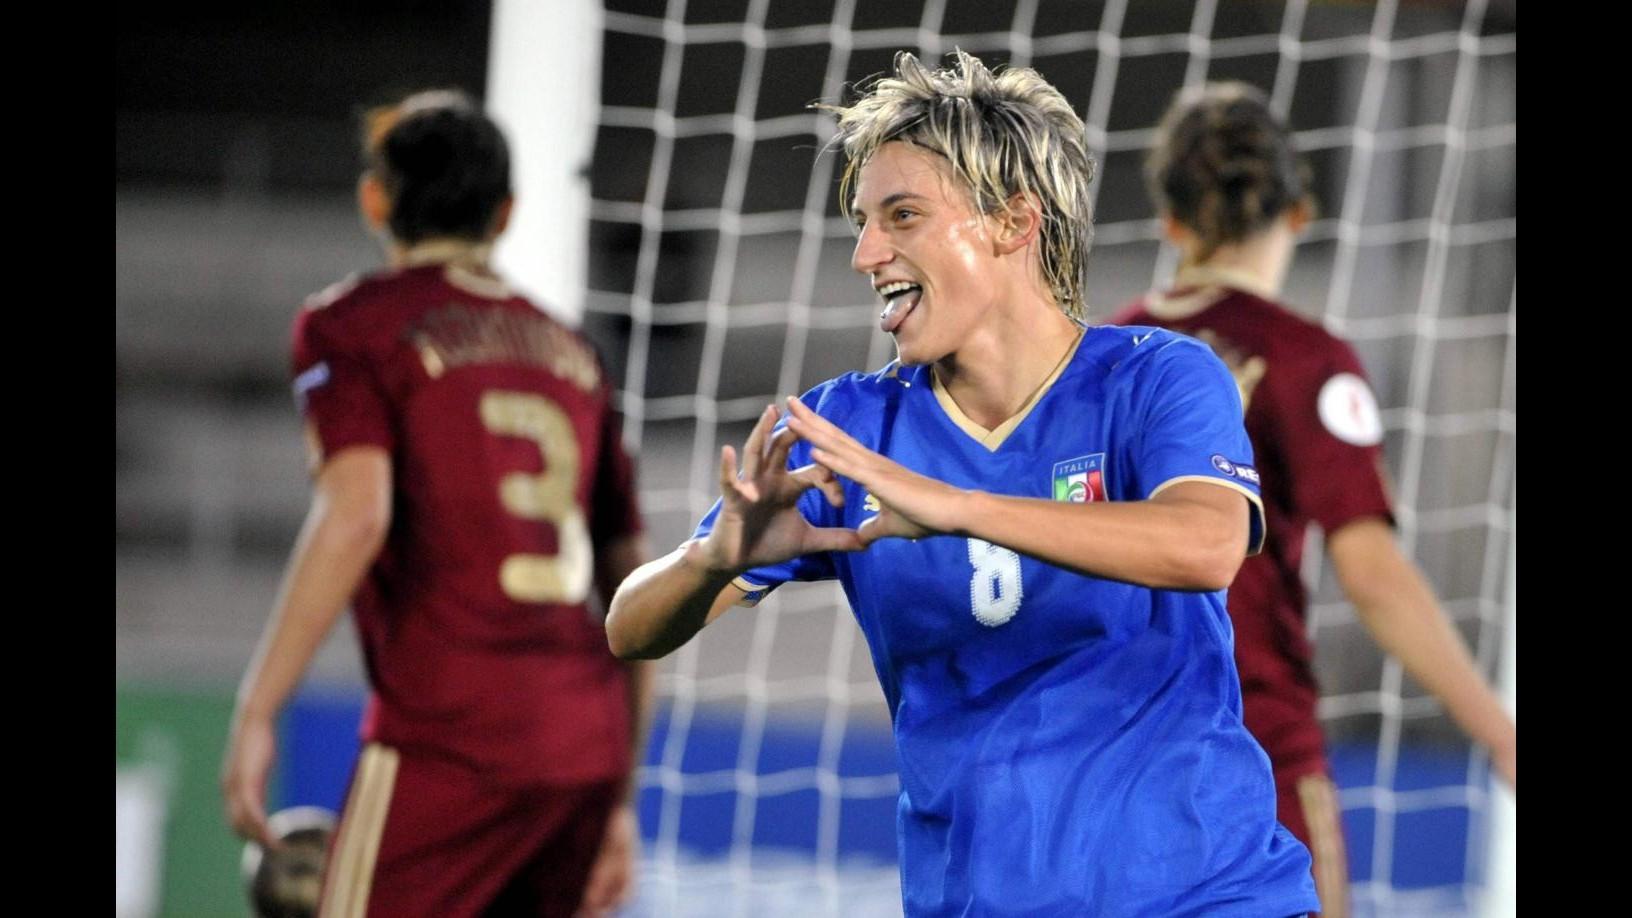 Calcio femminile, ranking Fifa: Usa primi, Italia tredicesima